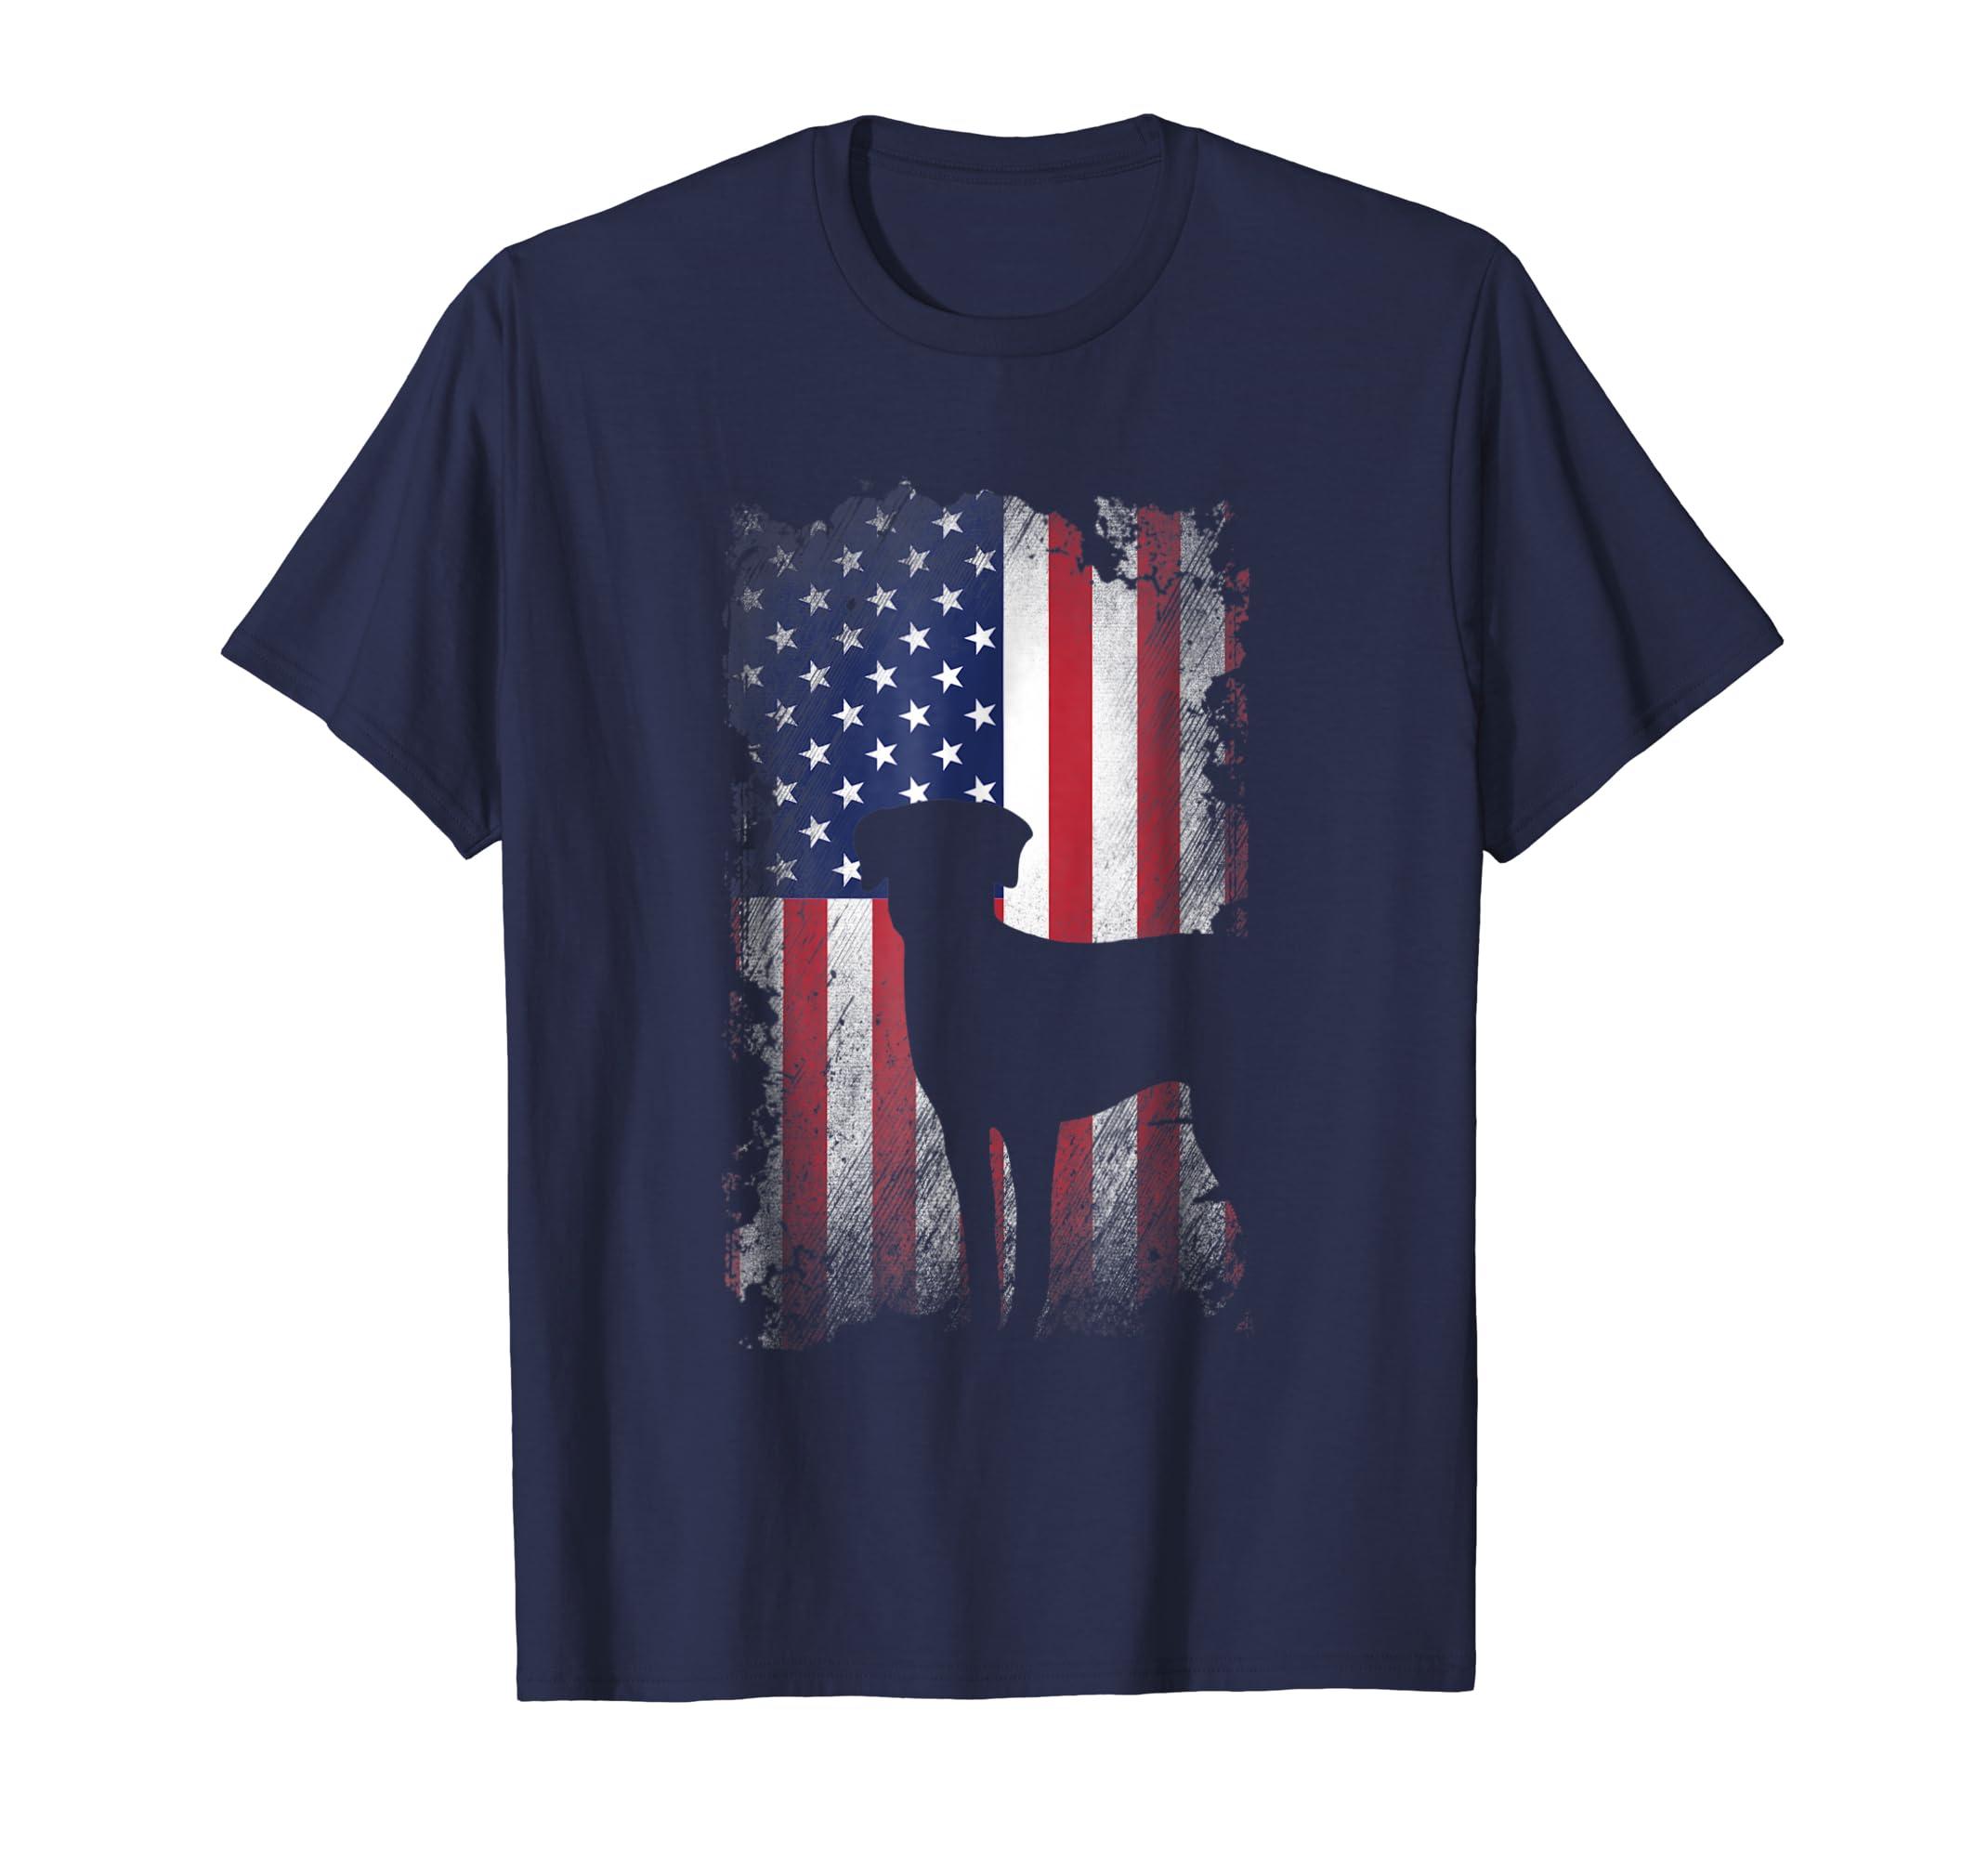 Catahoula Leopard Dog American Flag Shirt USA Patriotic Dog-AZP